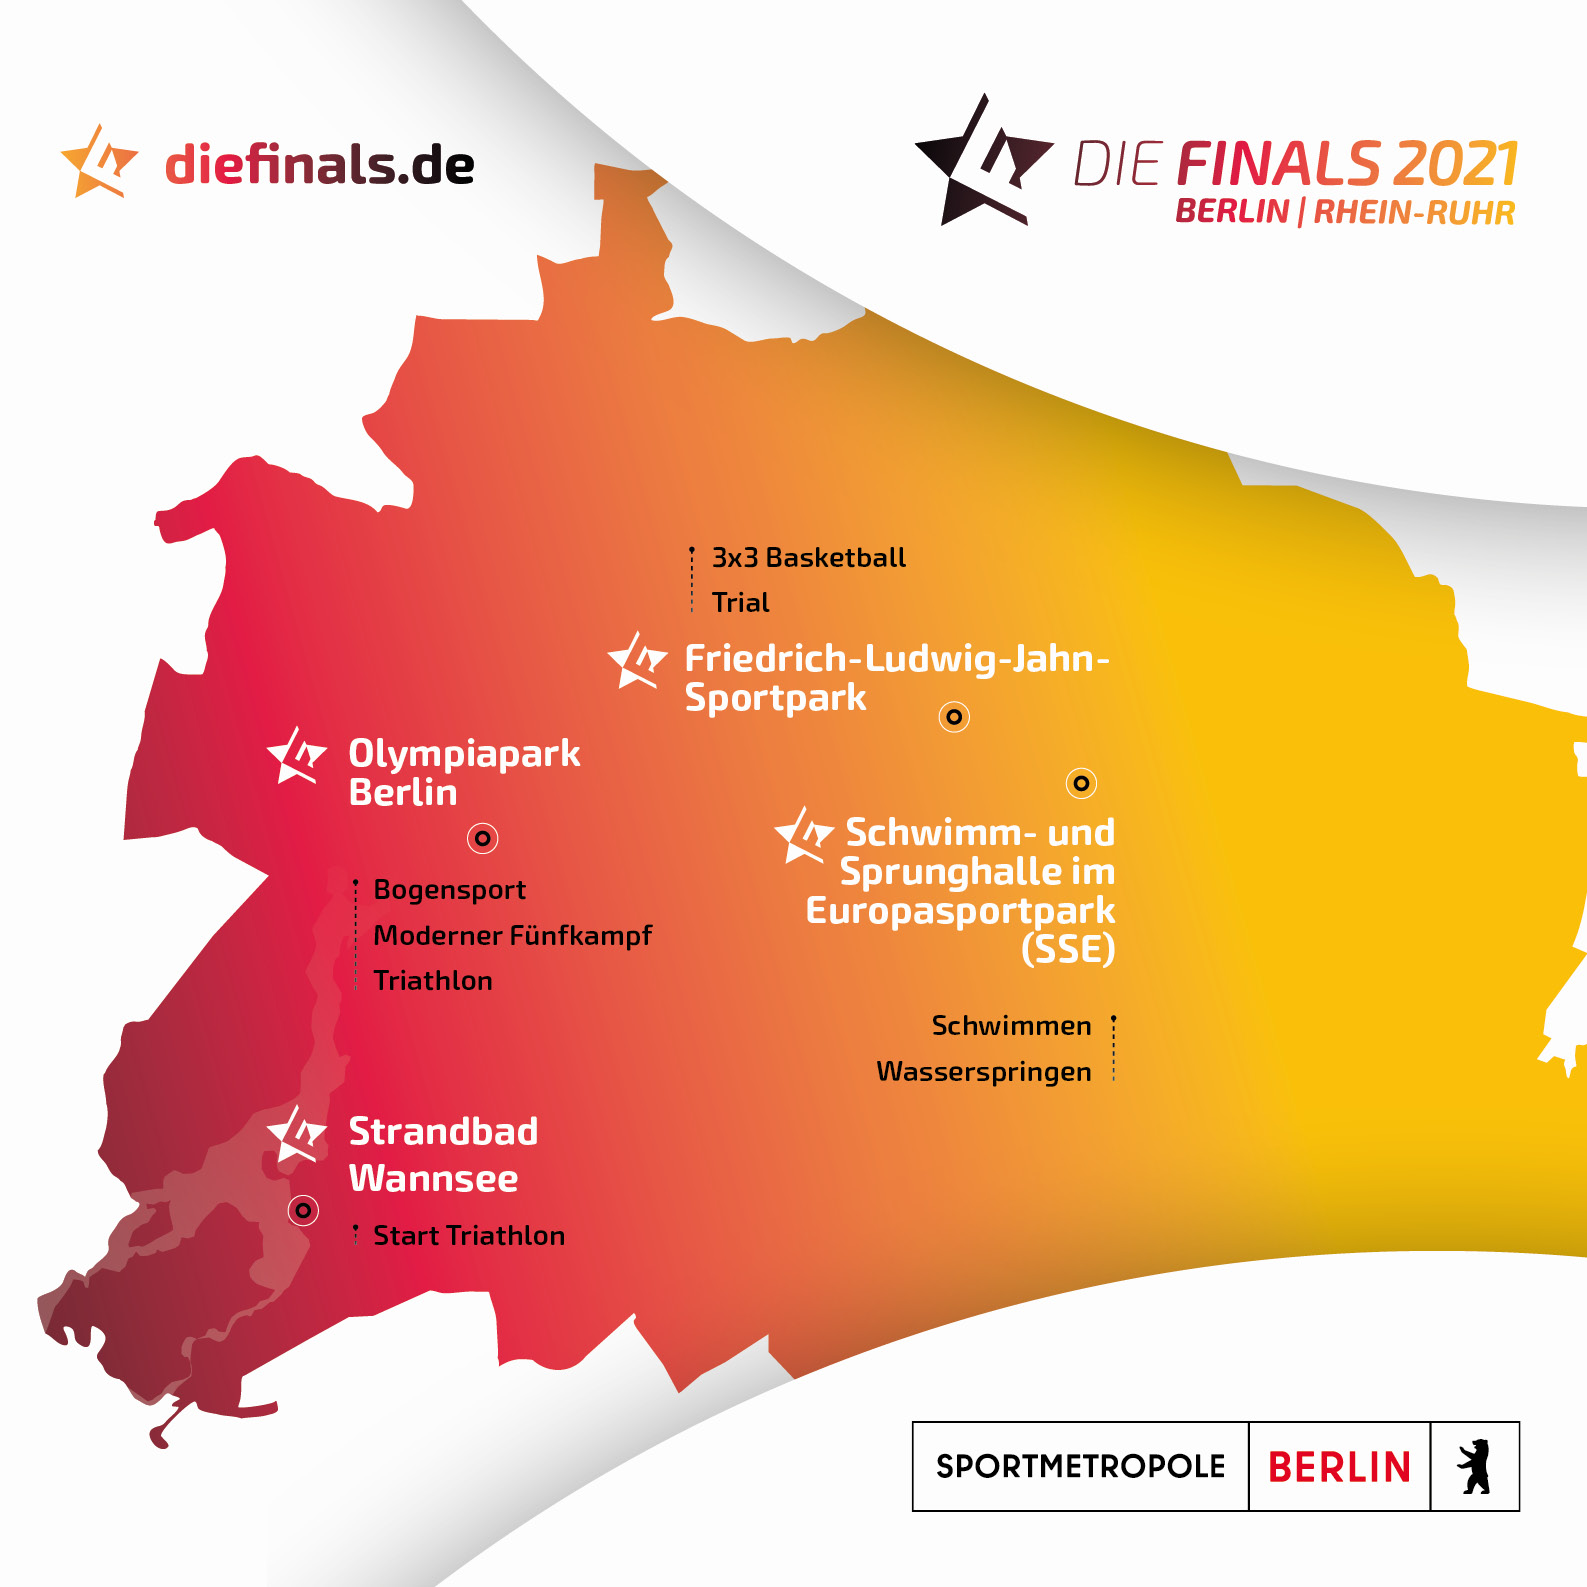 Die Finals 2021 Fünfkampf in Berlin